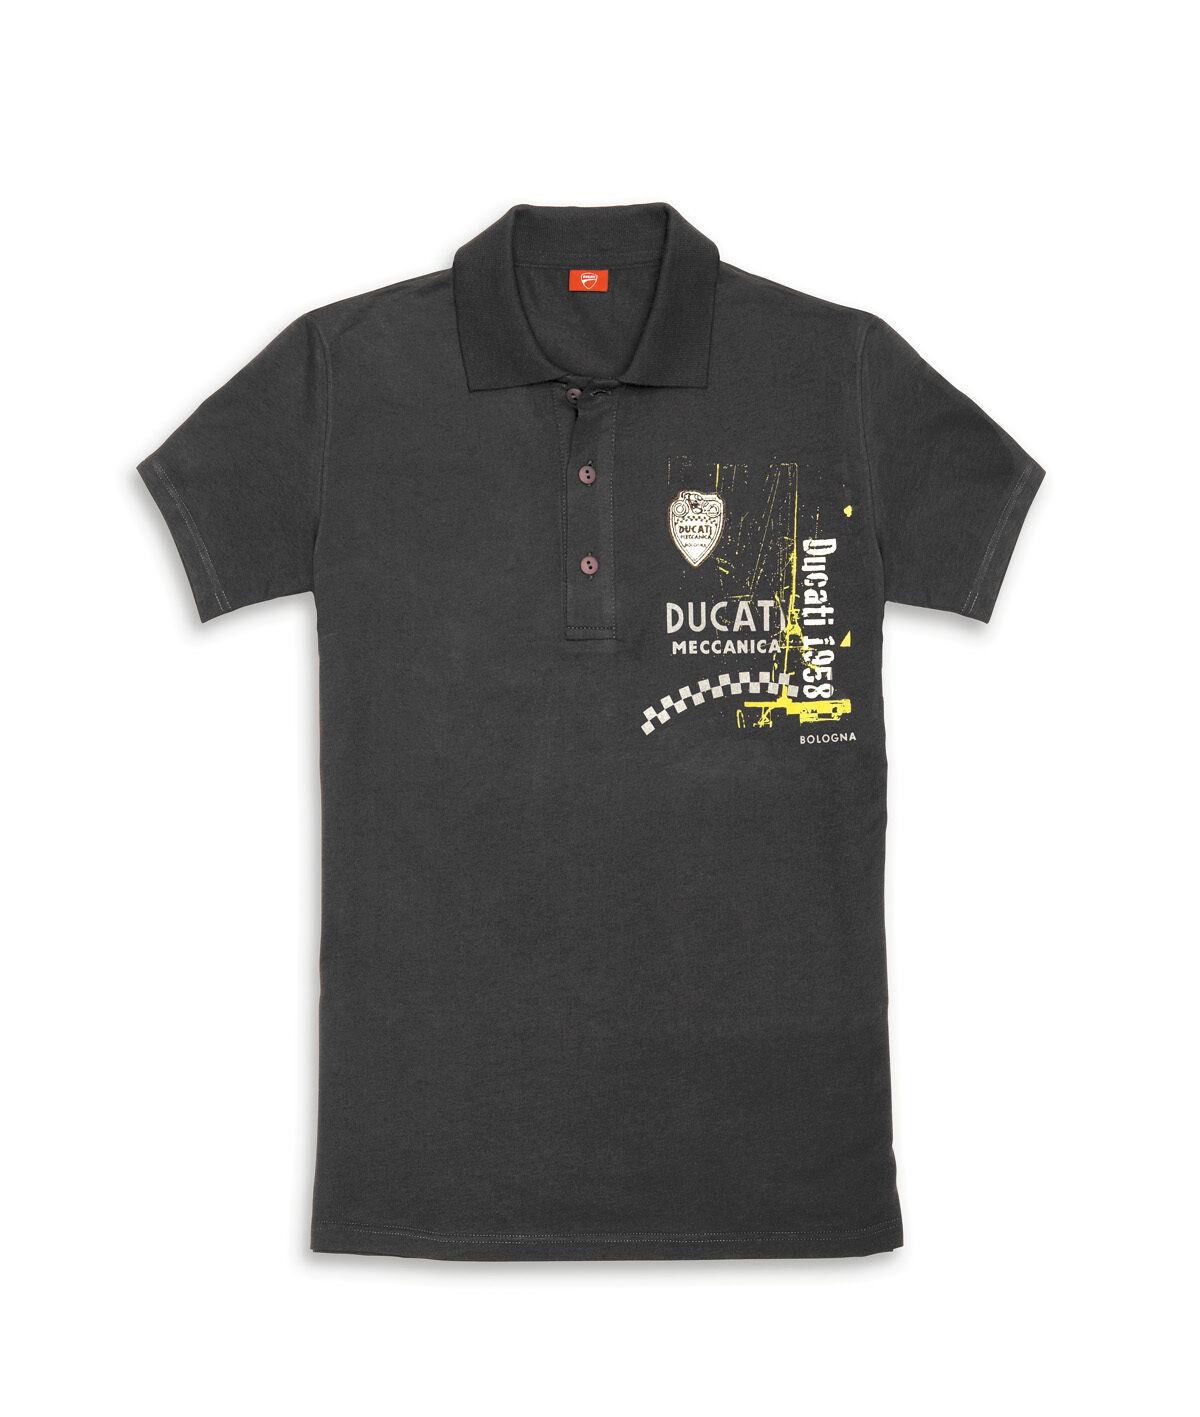 DUCATI RETRO Meccanica kurzarm Polo T-Shirt grey NEU